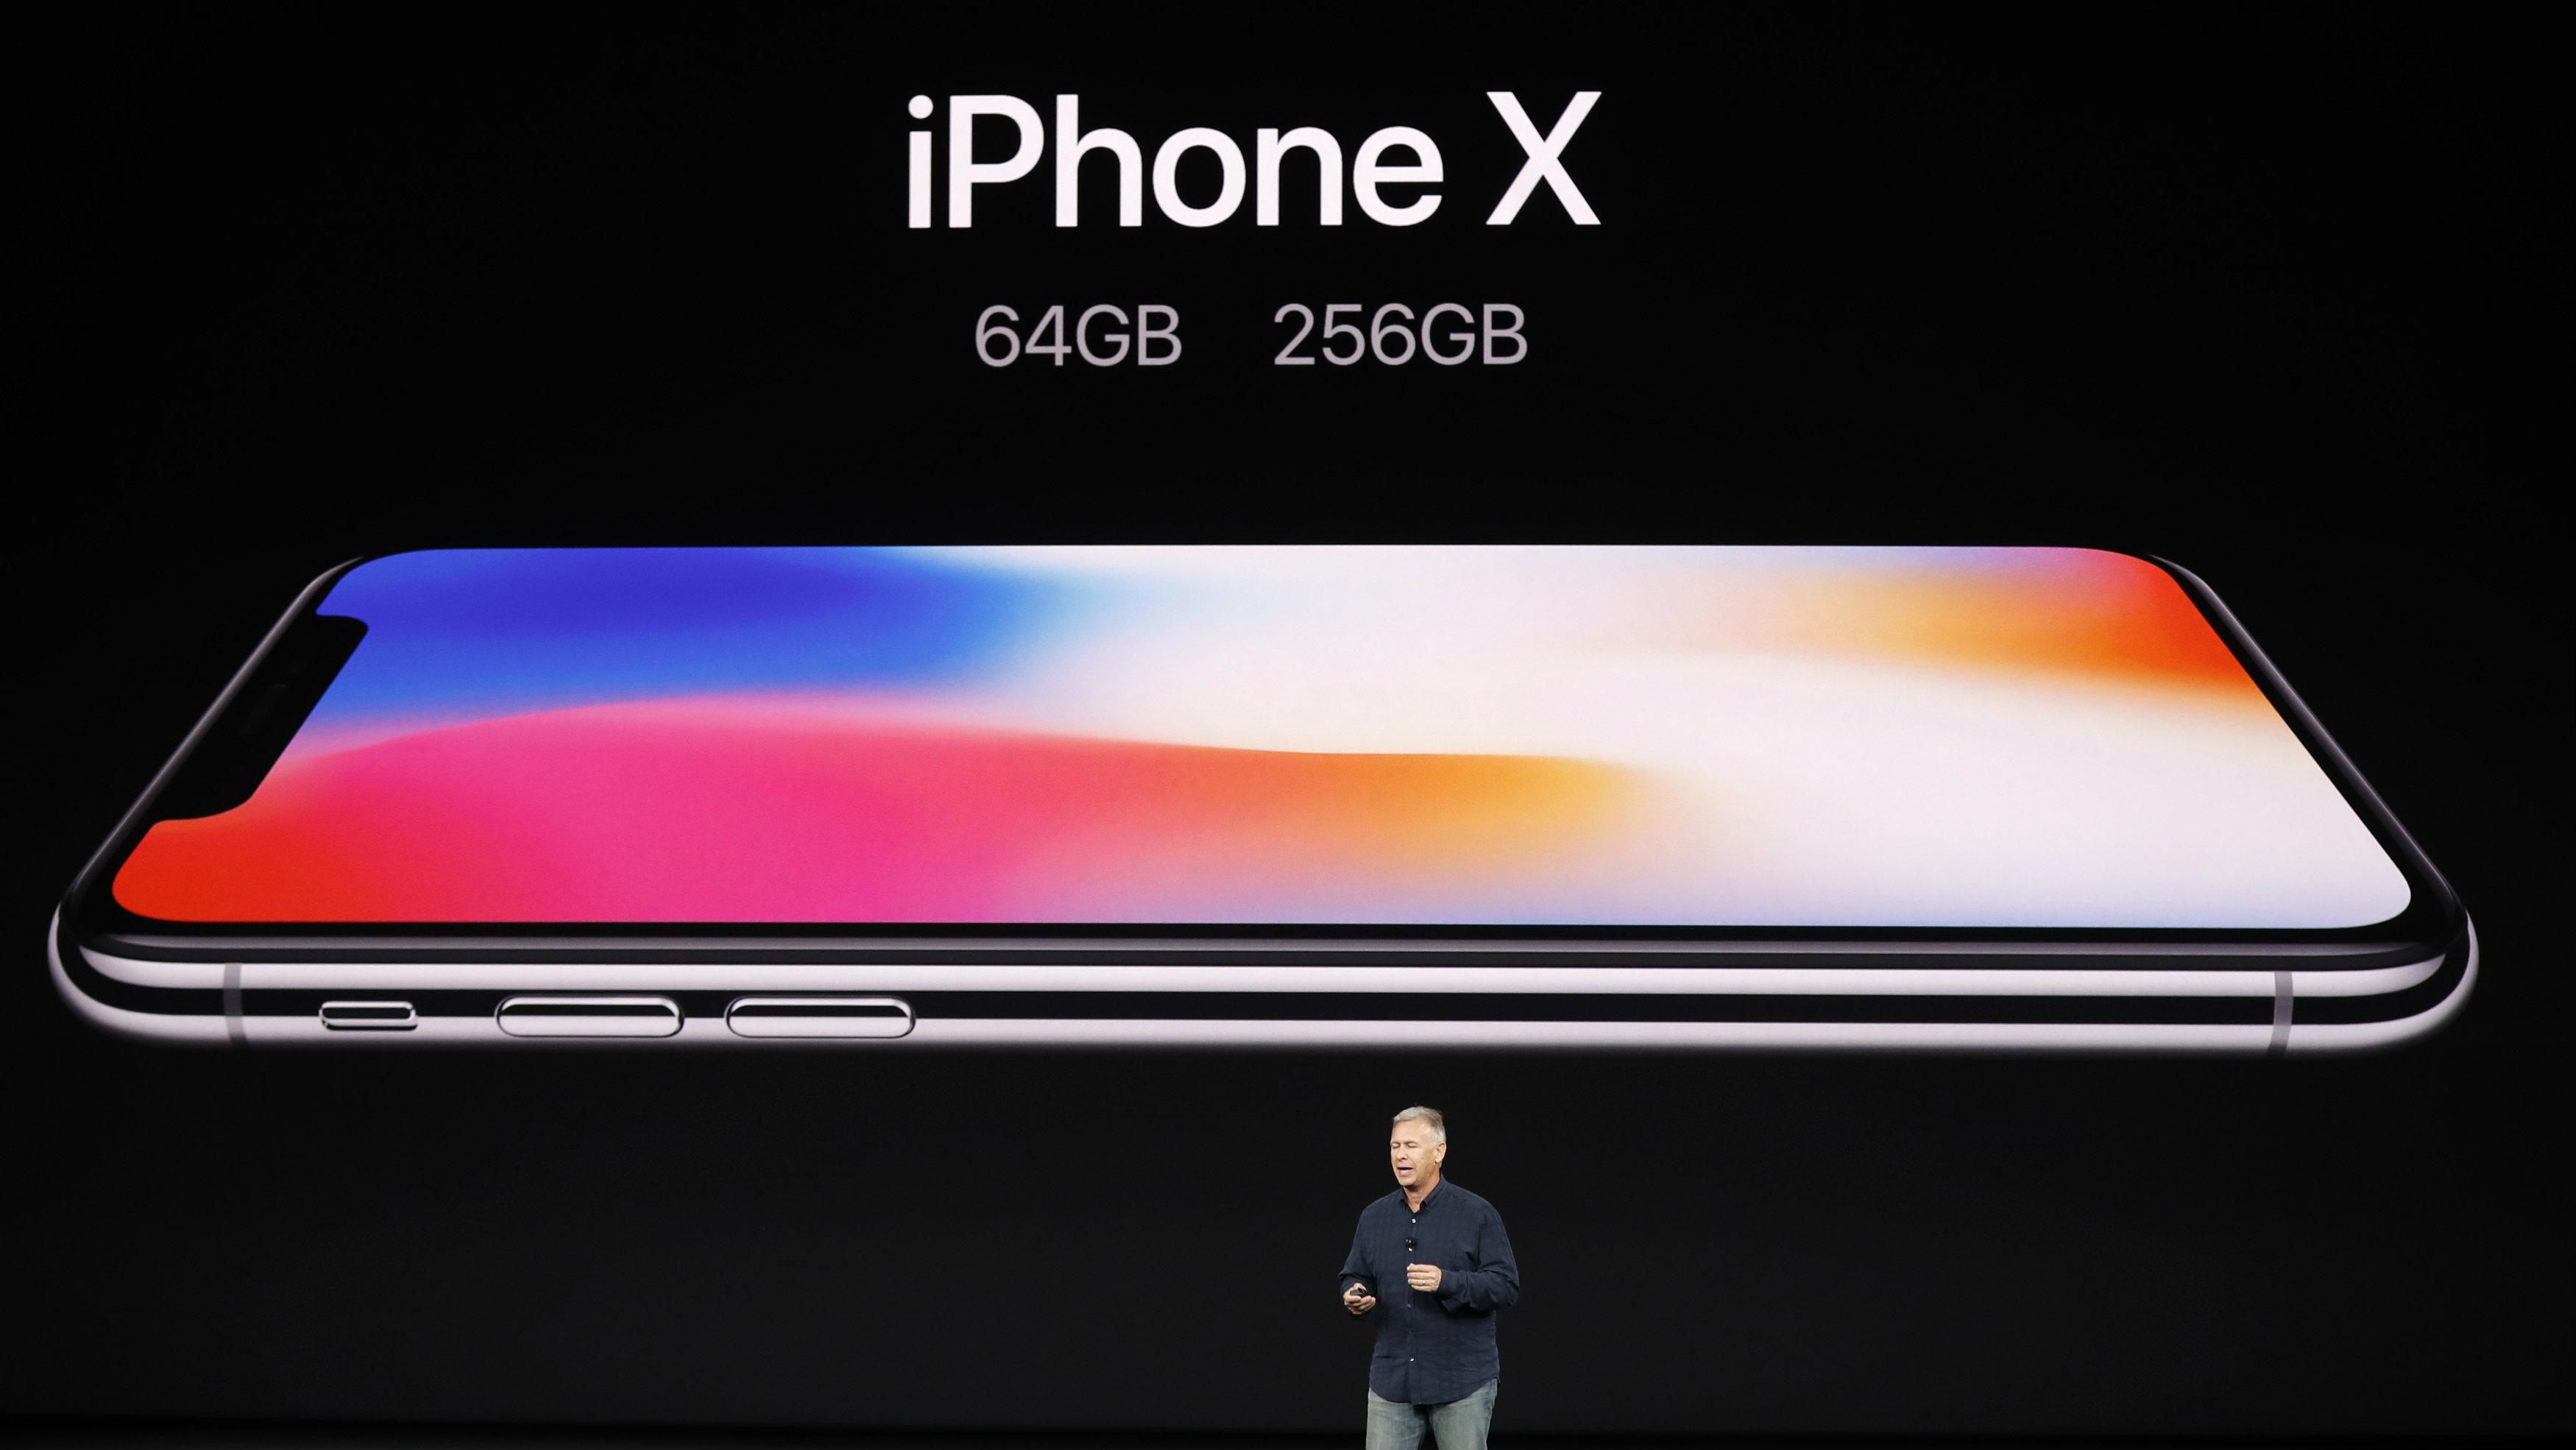 iphone x 256gb black price in kuwait